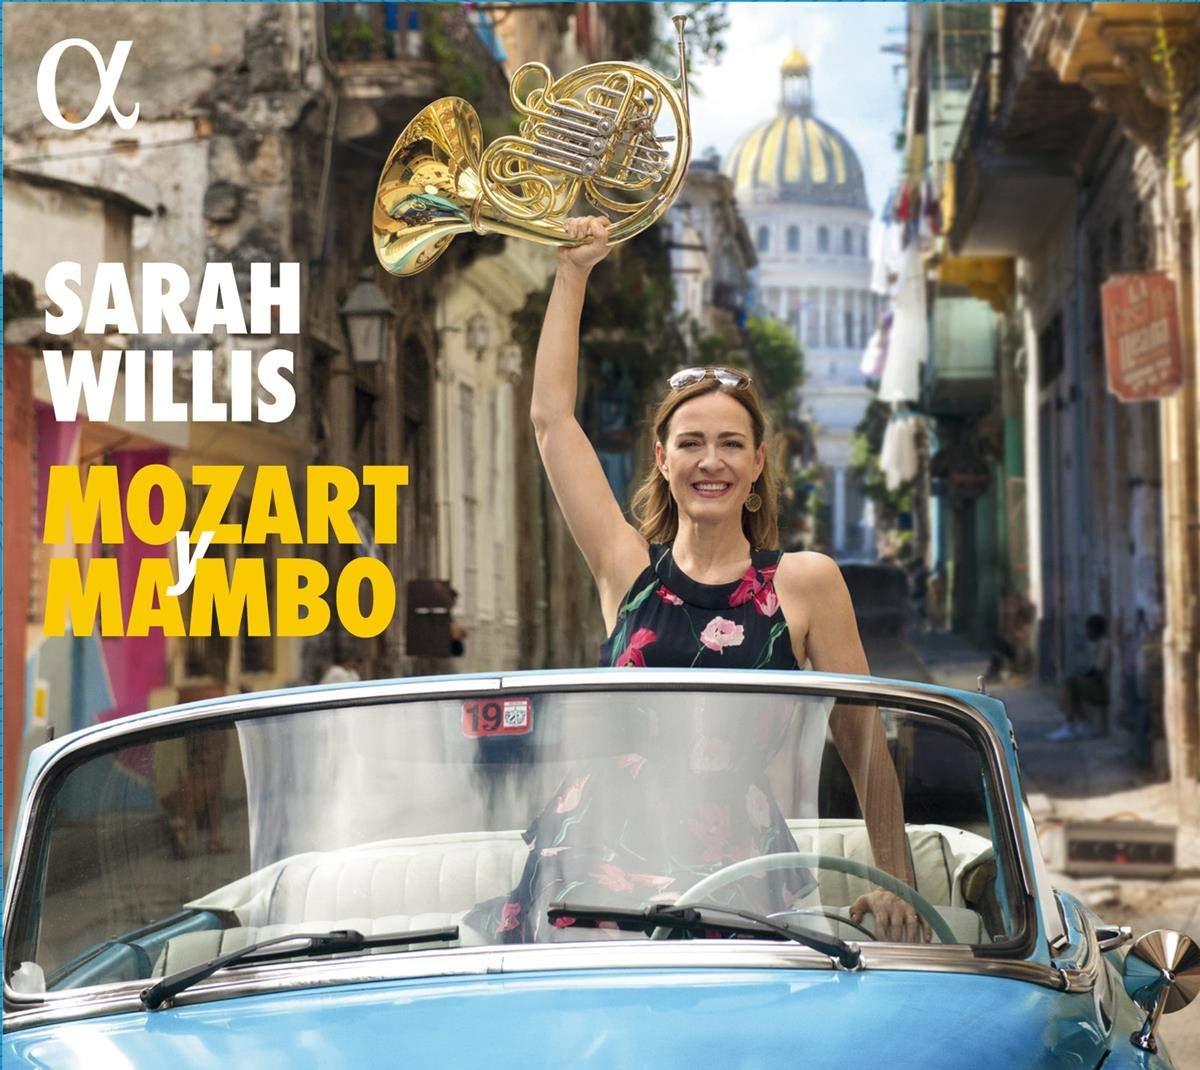 Sarah Willis, Various, Wolfgang Amadeus Mozart, __ - Mozart y Mambo - Amazon.com Music